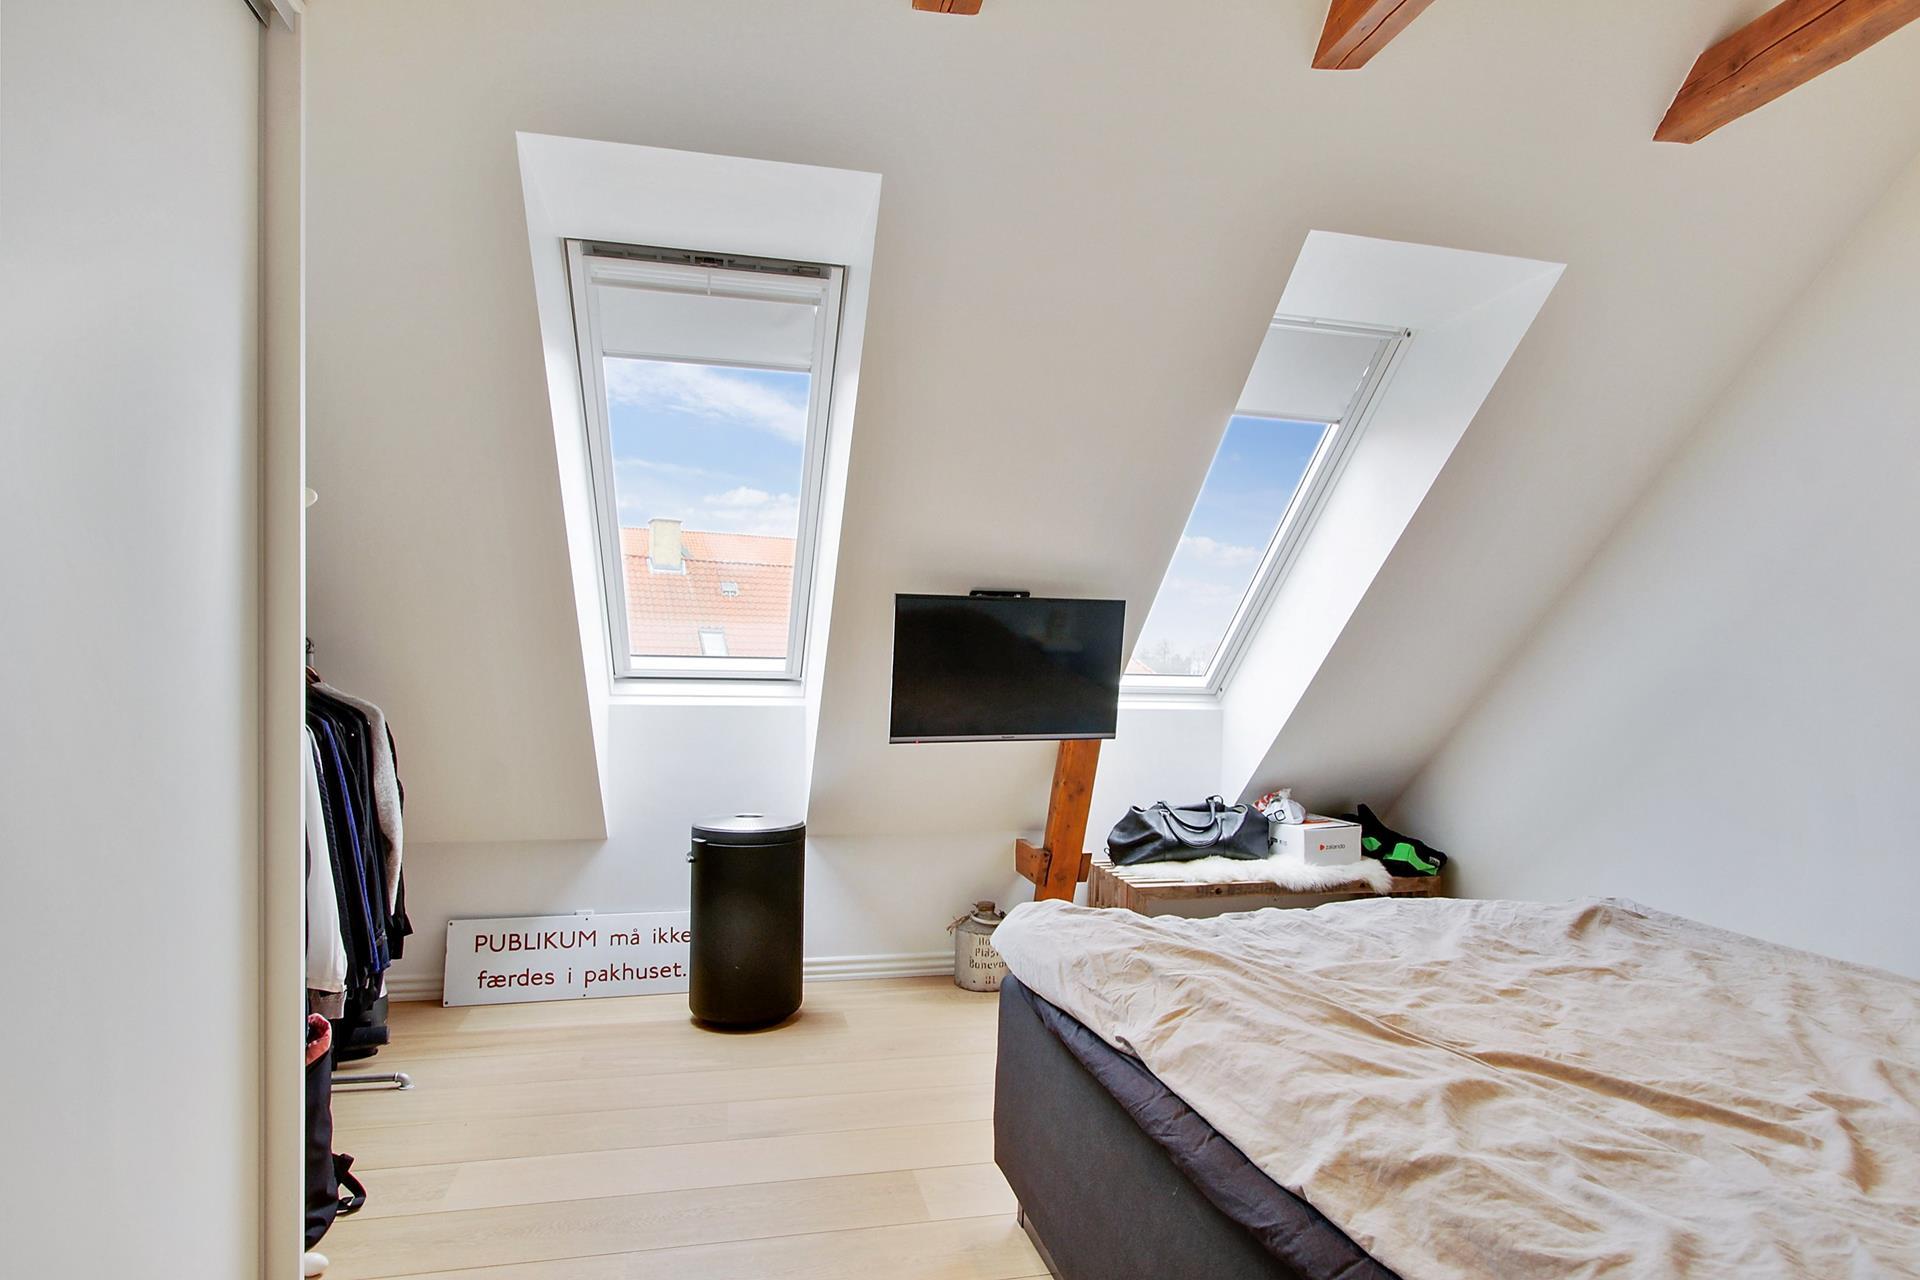 Boligudlejning på Bryggergade i Nørresundby - Soveværelse